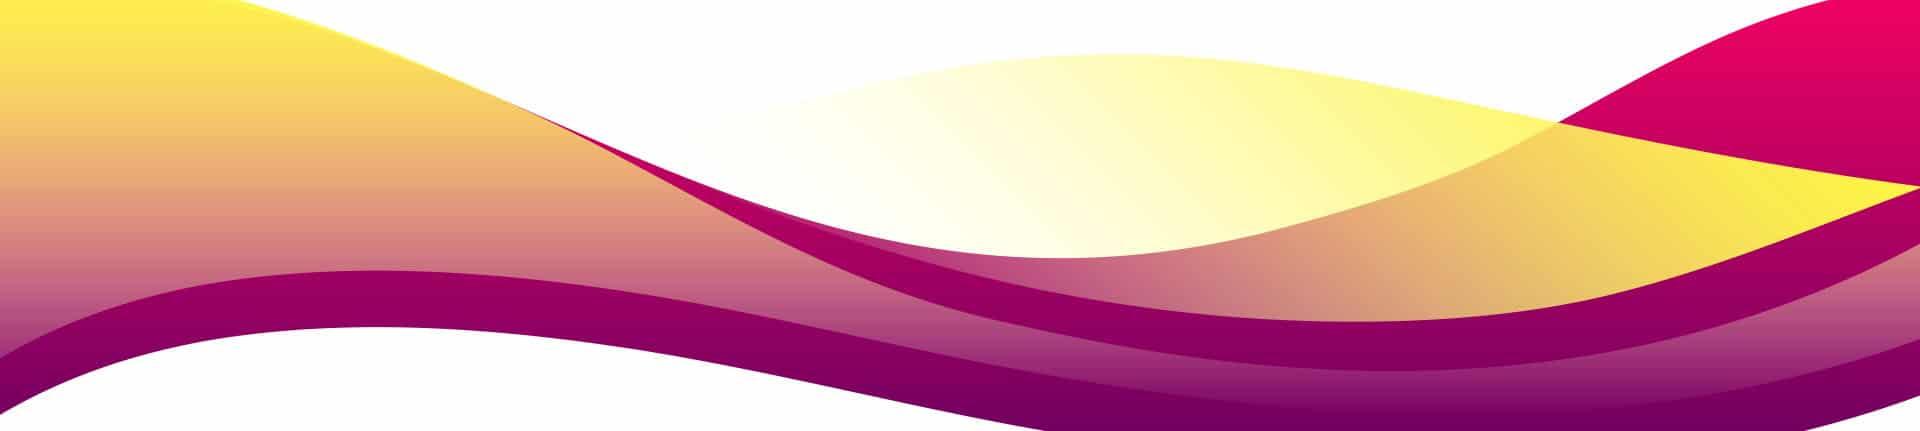 Fun EIX banner image